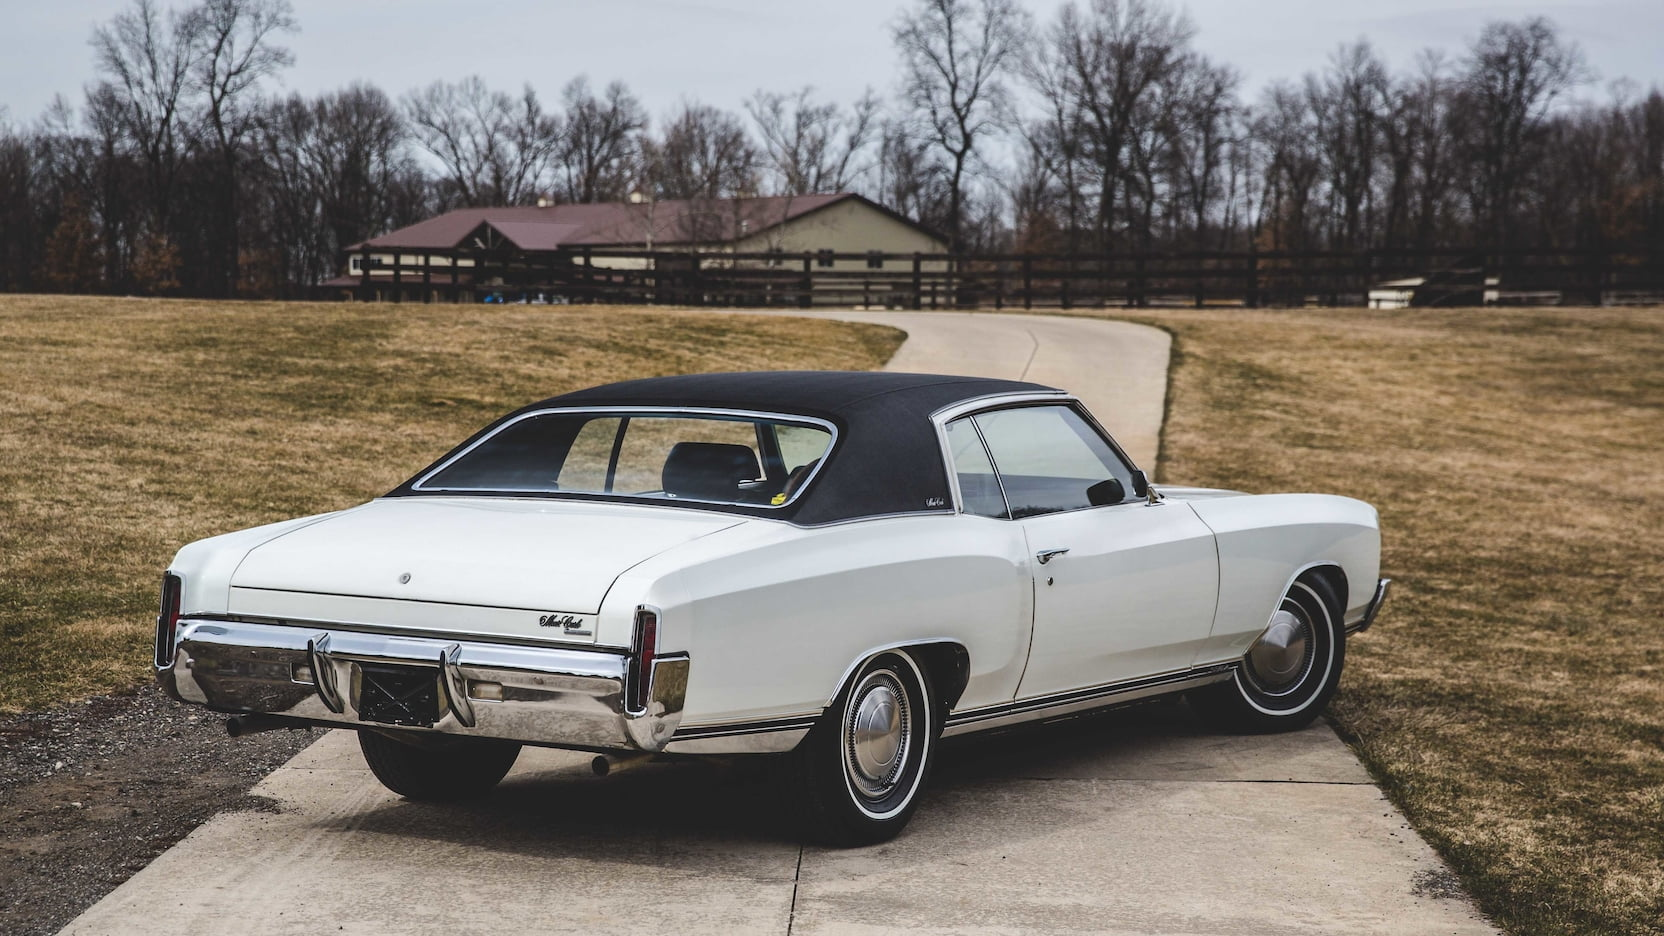 1970 Chevrolet Monte Carlo SS rear 3/4